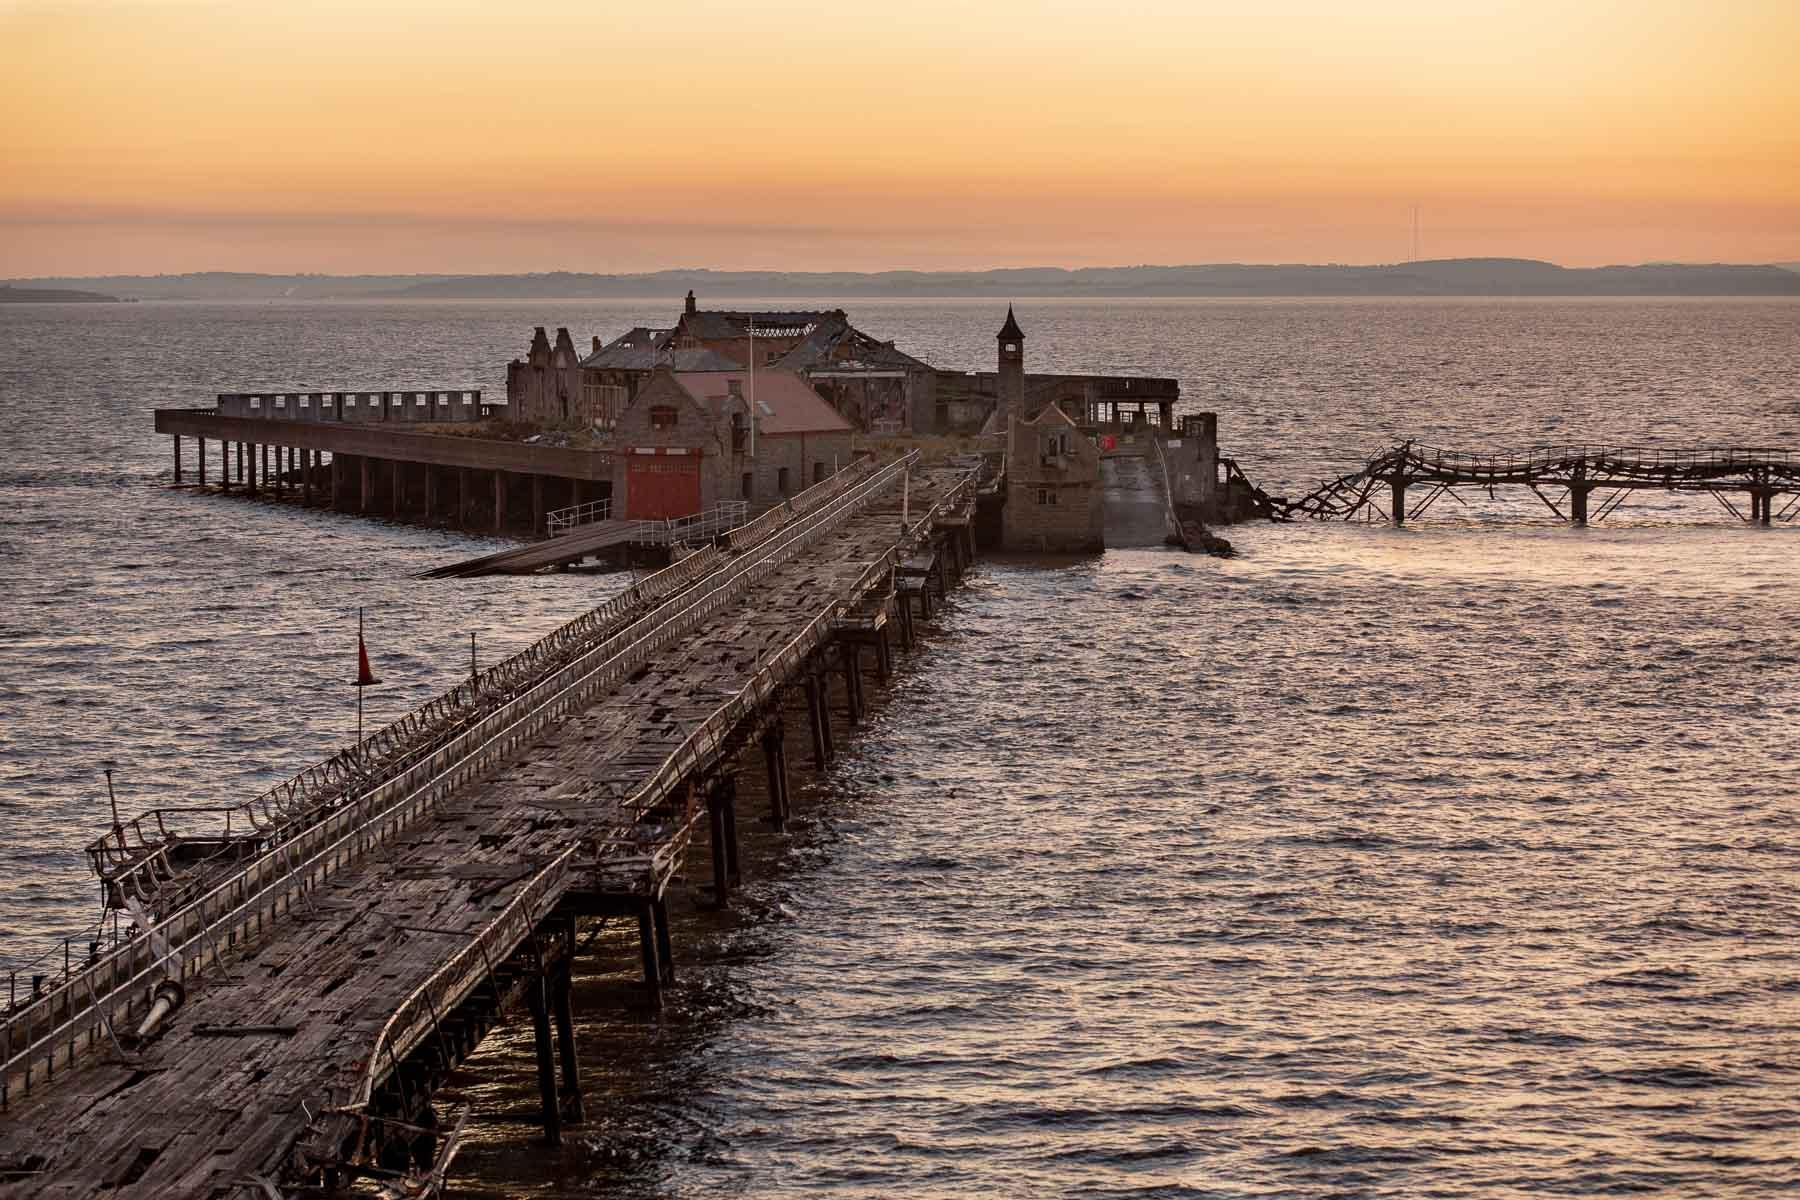 weston-super-mare-pier-landscape-natalia-smith-photography-0024.jpg